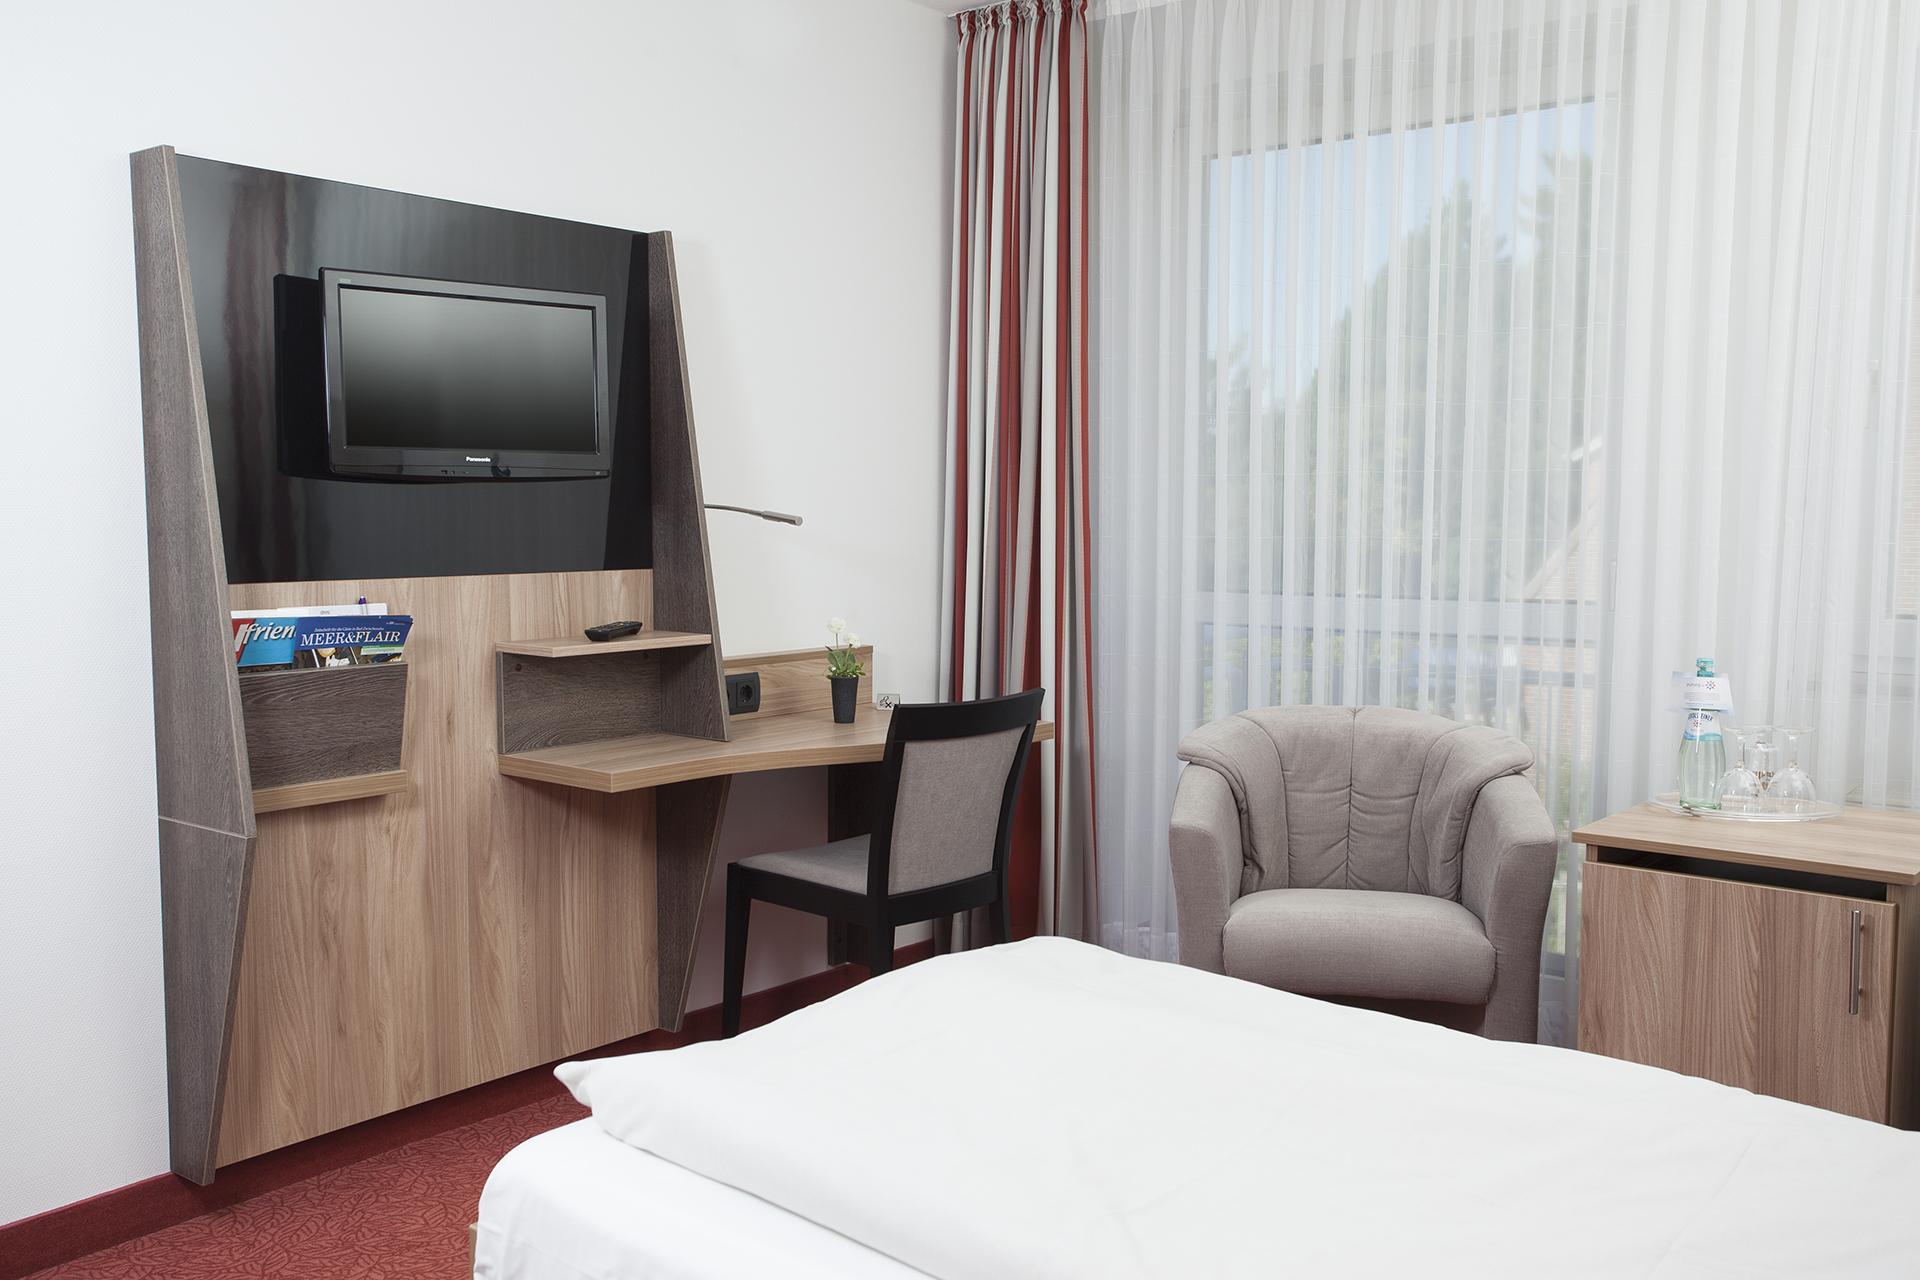 Berufsfotografin-Liesa-Flemming-Hotel-Kämper-04